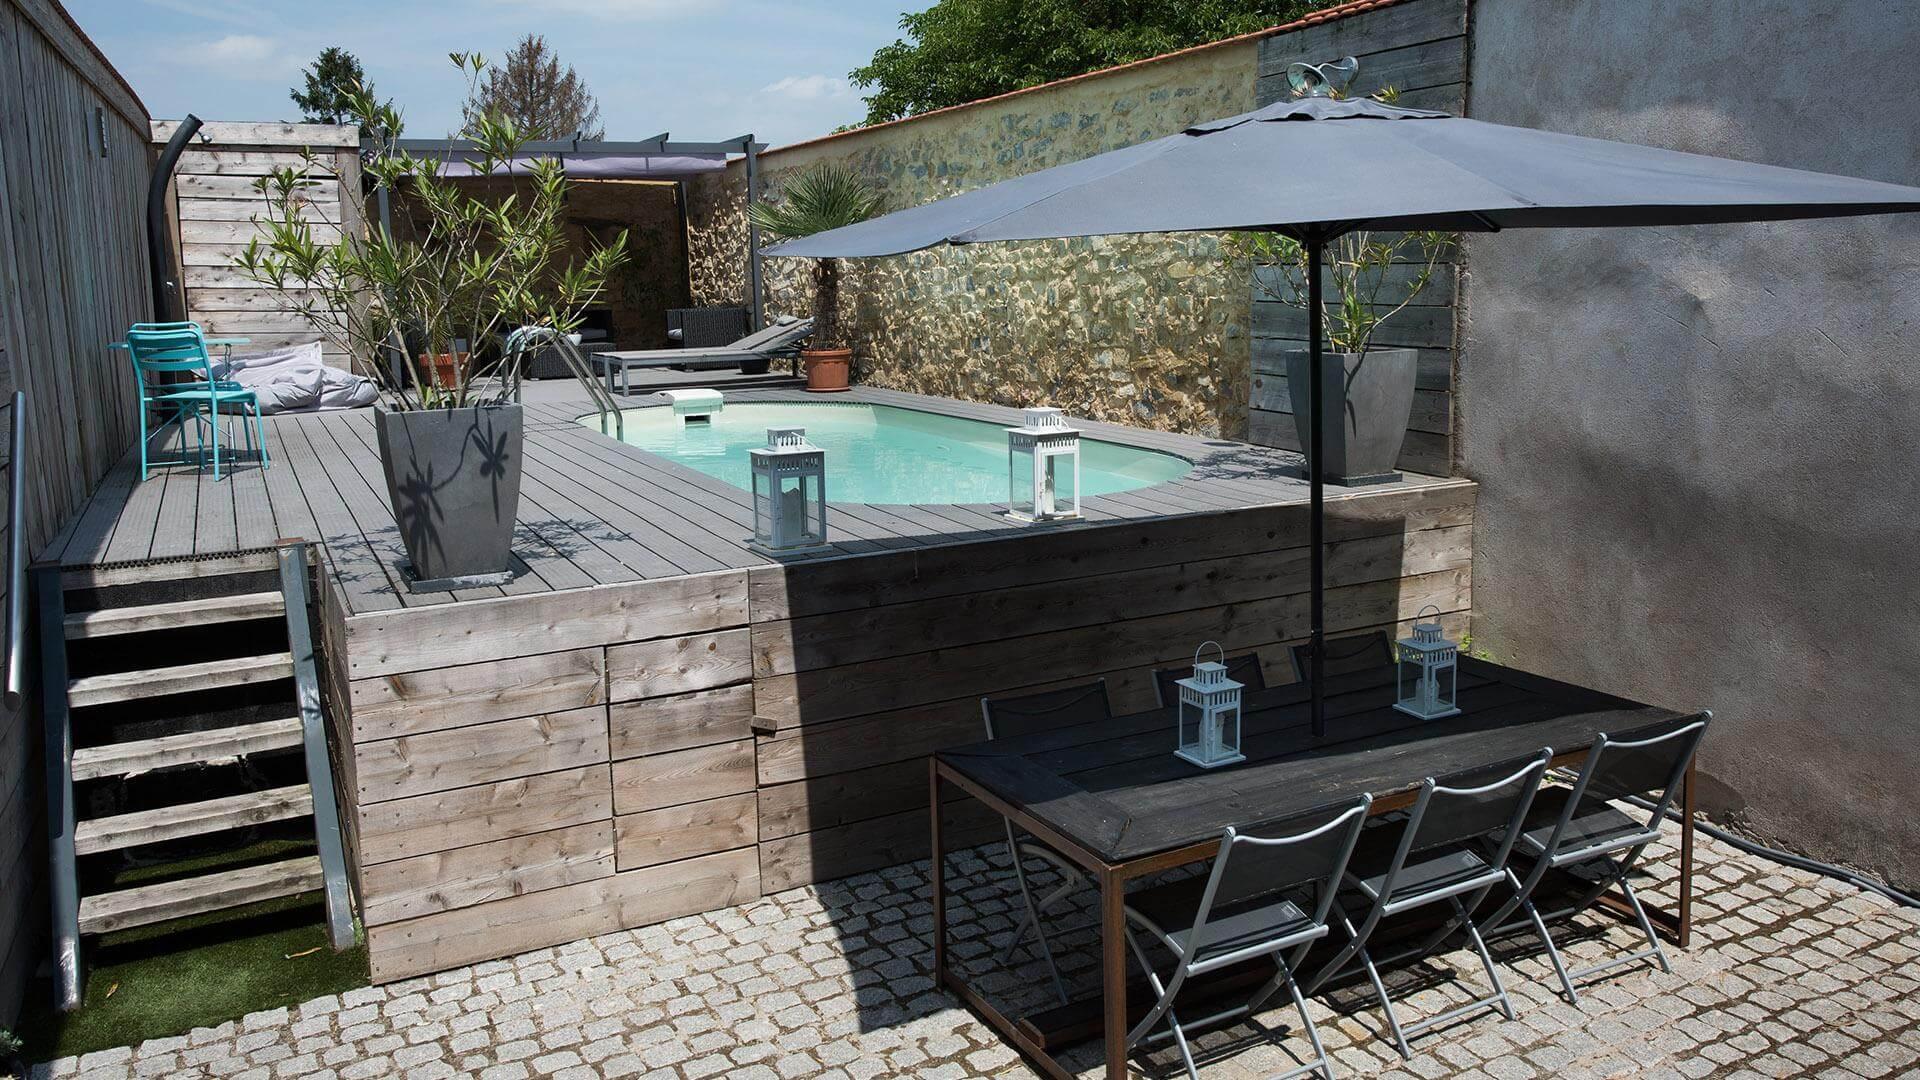 piscine ovale olivia l 39 espace de nage id al piscines waterair. Black Bedroom Furniture Sets. Home Design Ideas